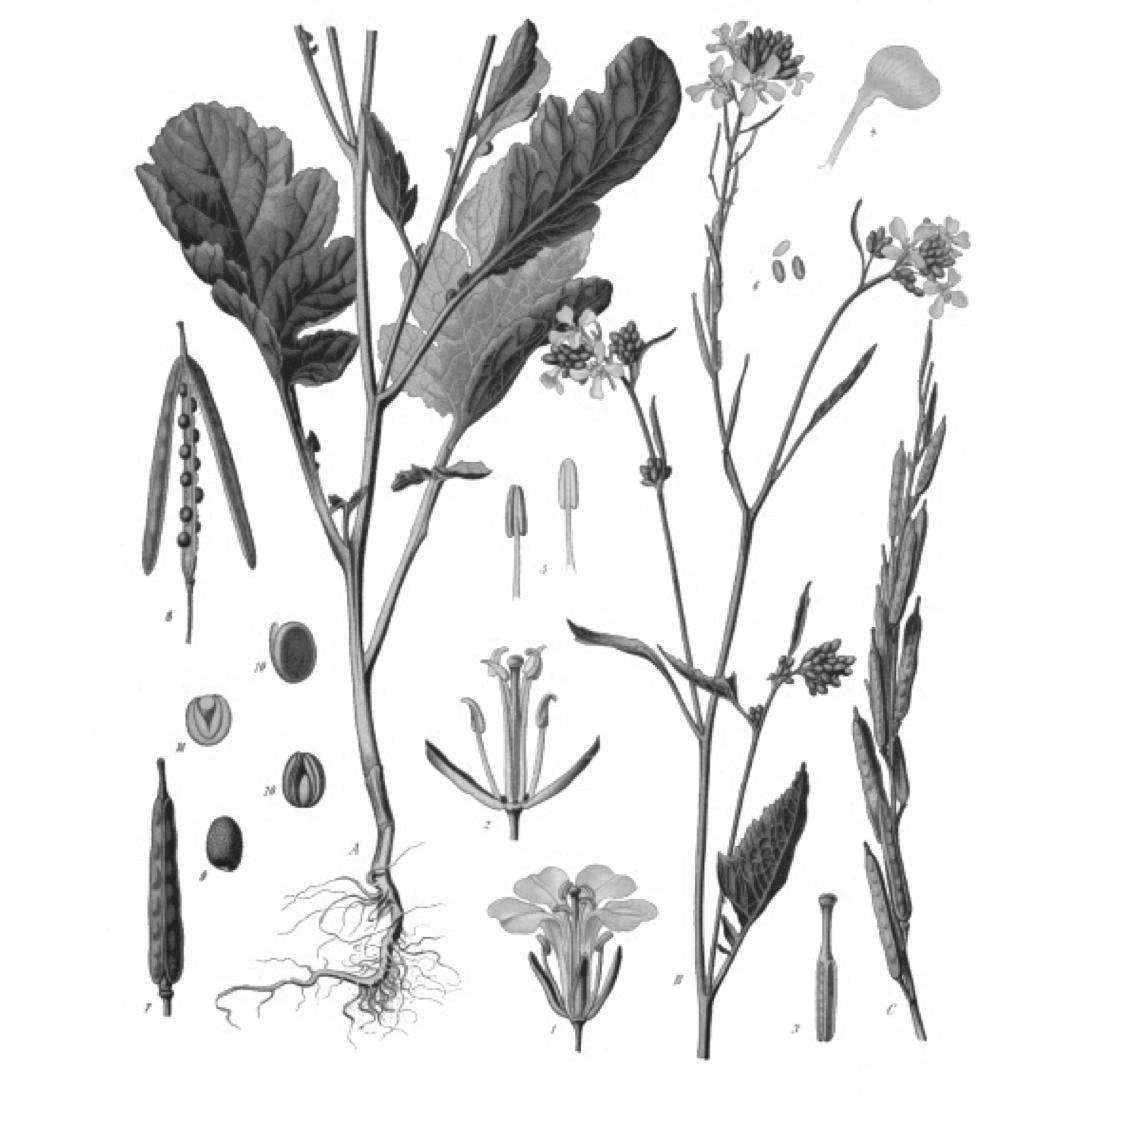 sinapis nigra